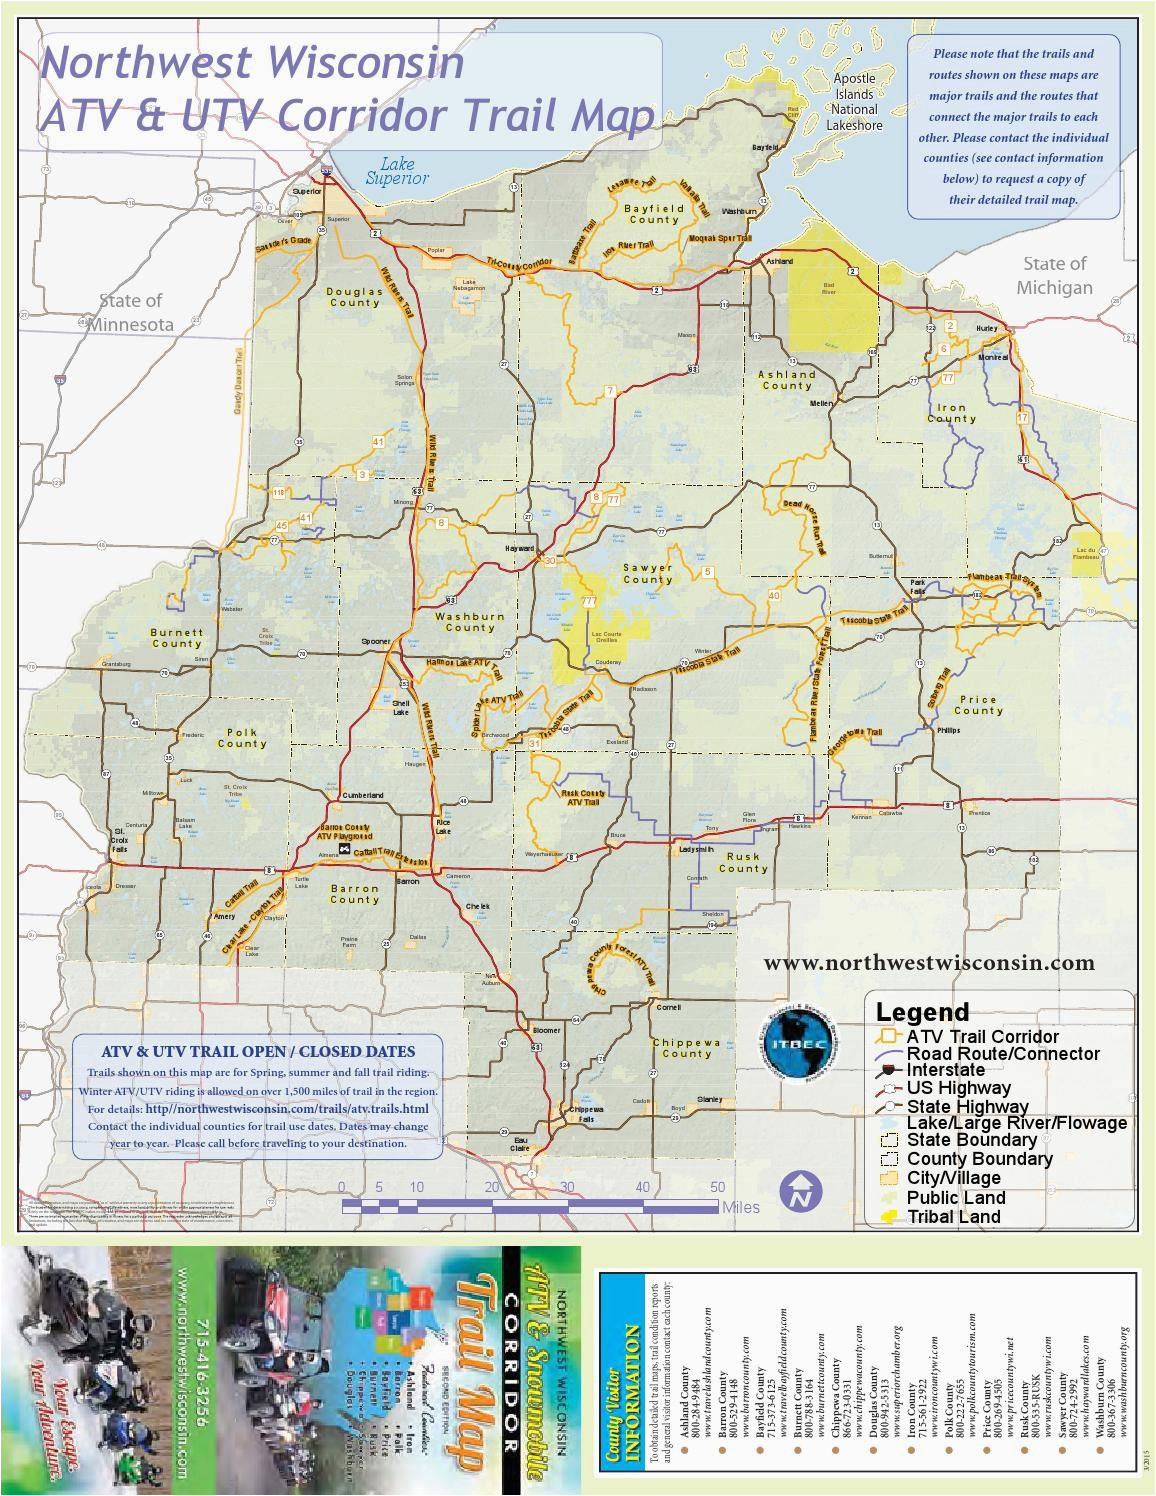 Minnesota Snowmobile Trail Map Nw Wisconsin atv Snowmobile Corridor Map 4 Wheeling Trail Maps